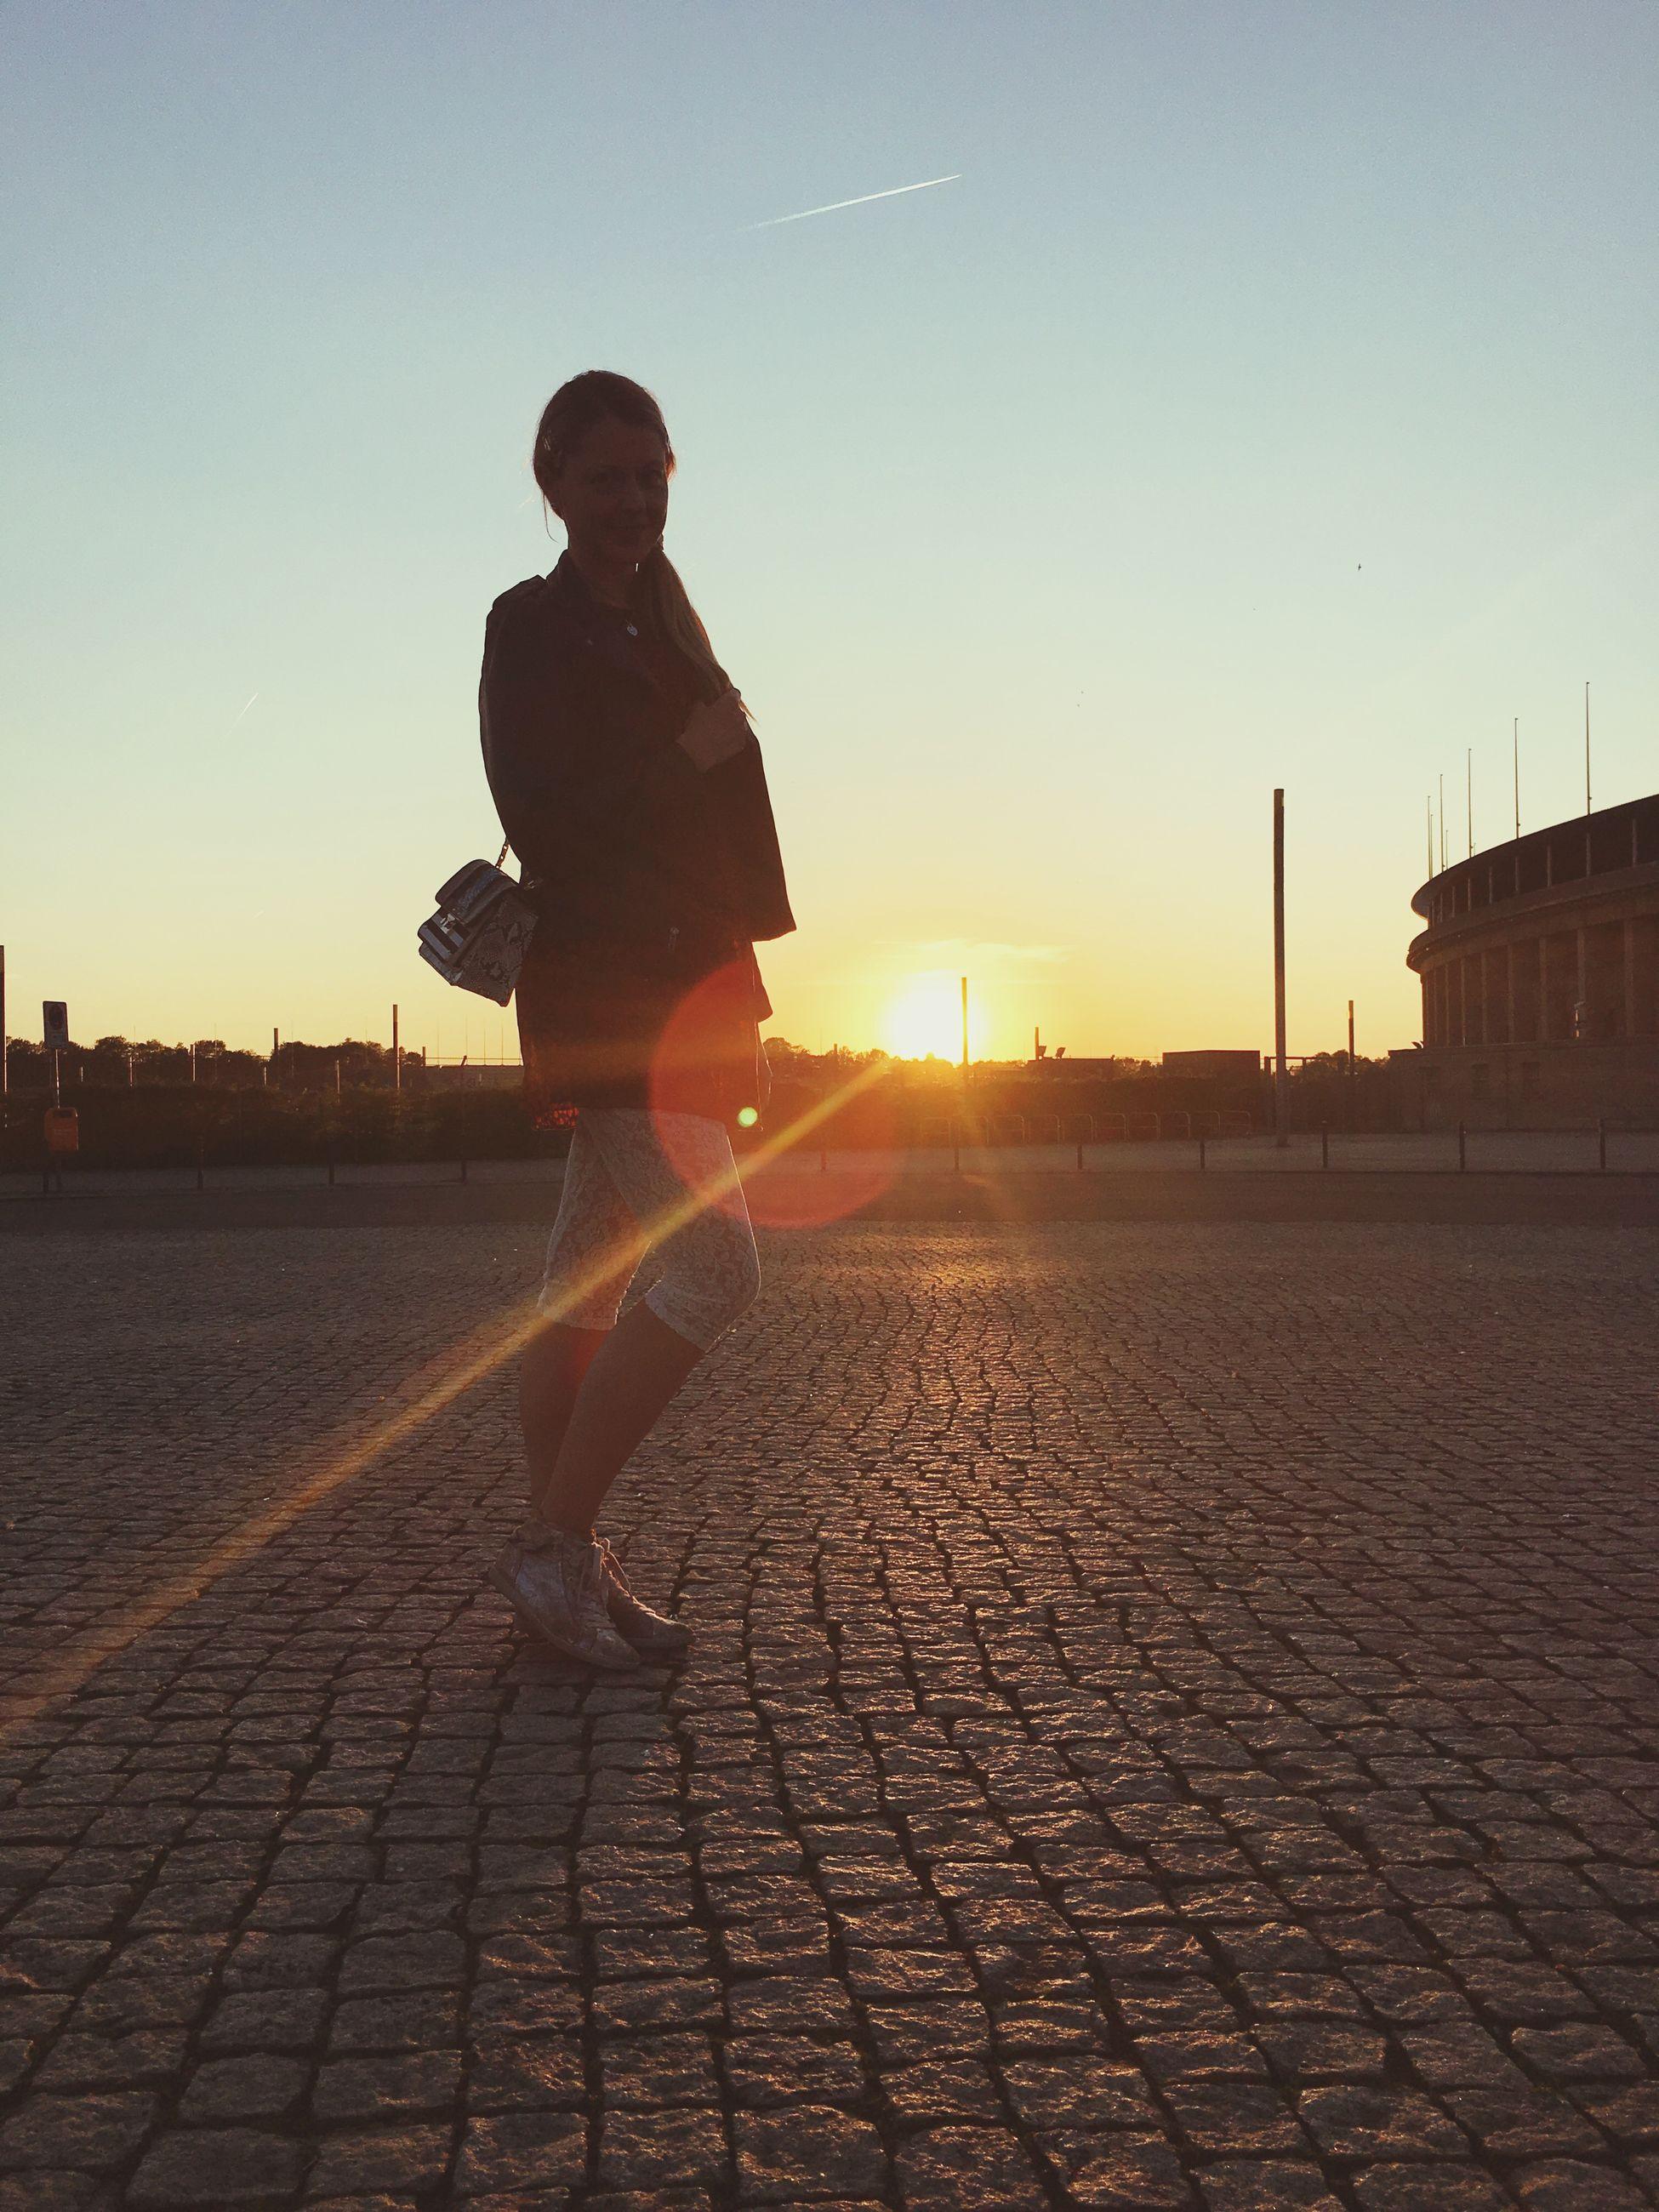 sun, sunset, sunbeam, lens flare, building exterior, sunlight, built structure, architecture, sky, statue, sculpture, human representation, city, street, silhouette, clear sky, outdoors, cobblestone, art, one person